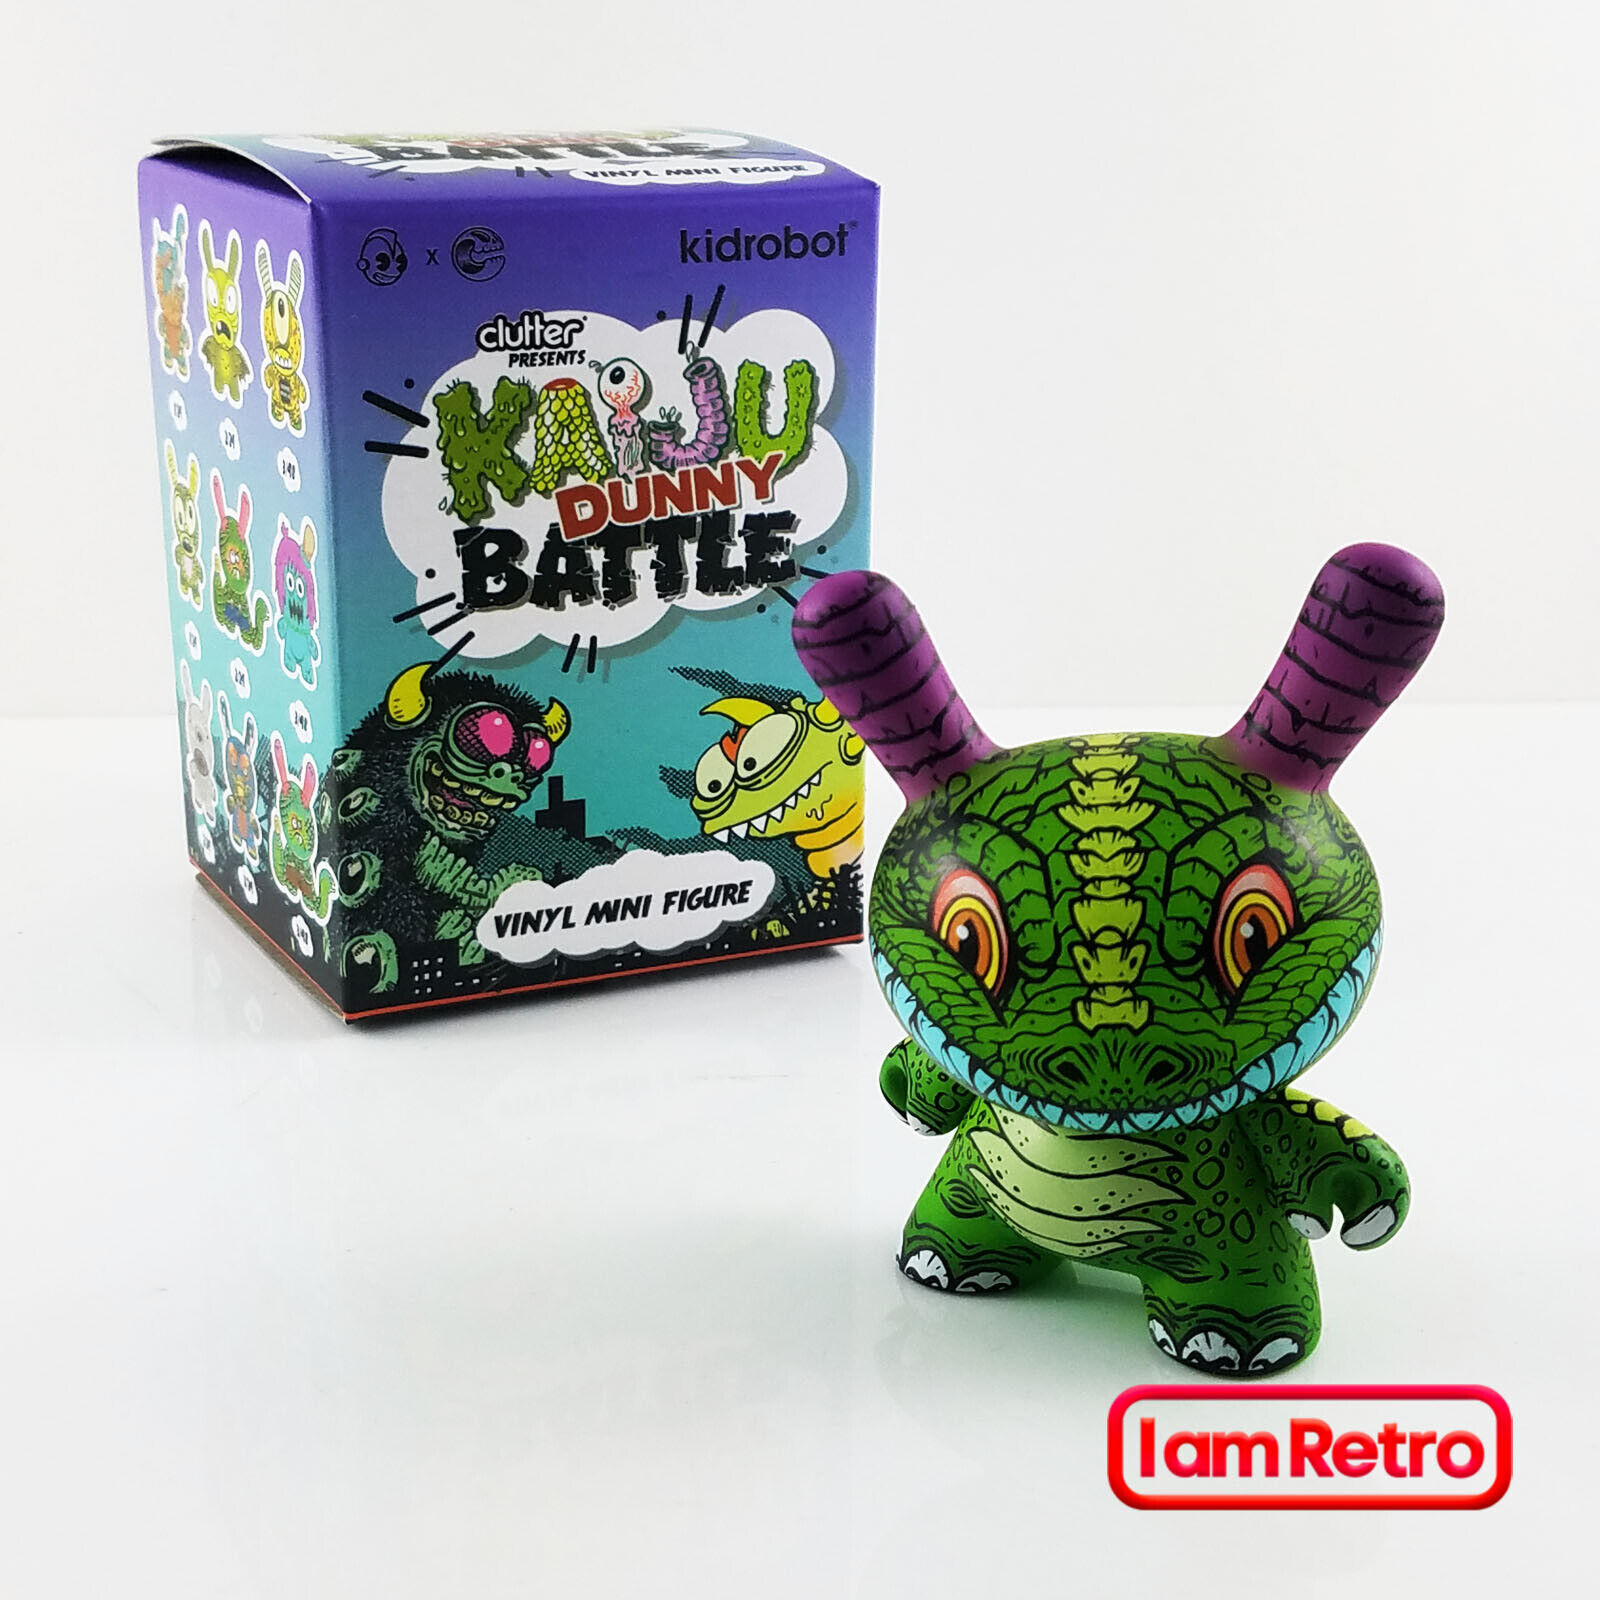 Dunny Saurus Rex - Kaiju Dunny Battle 3  Mini Figure Kidrobot Brand New in Box